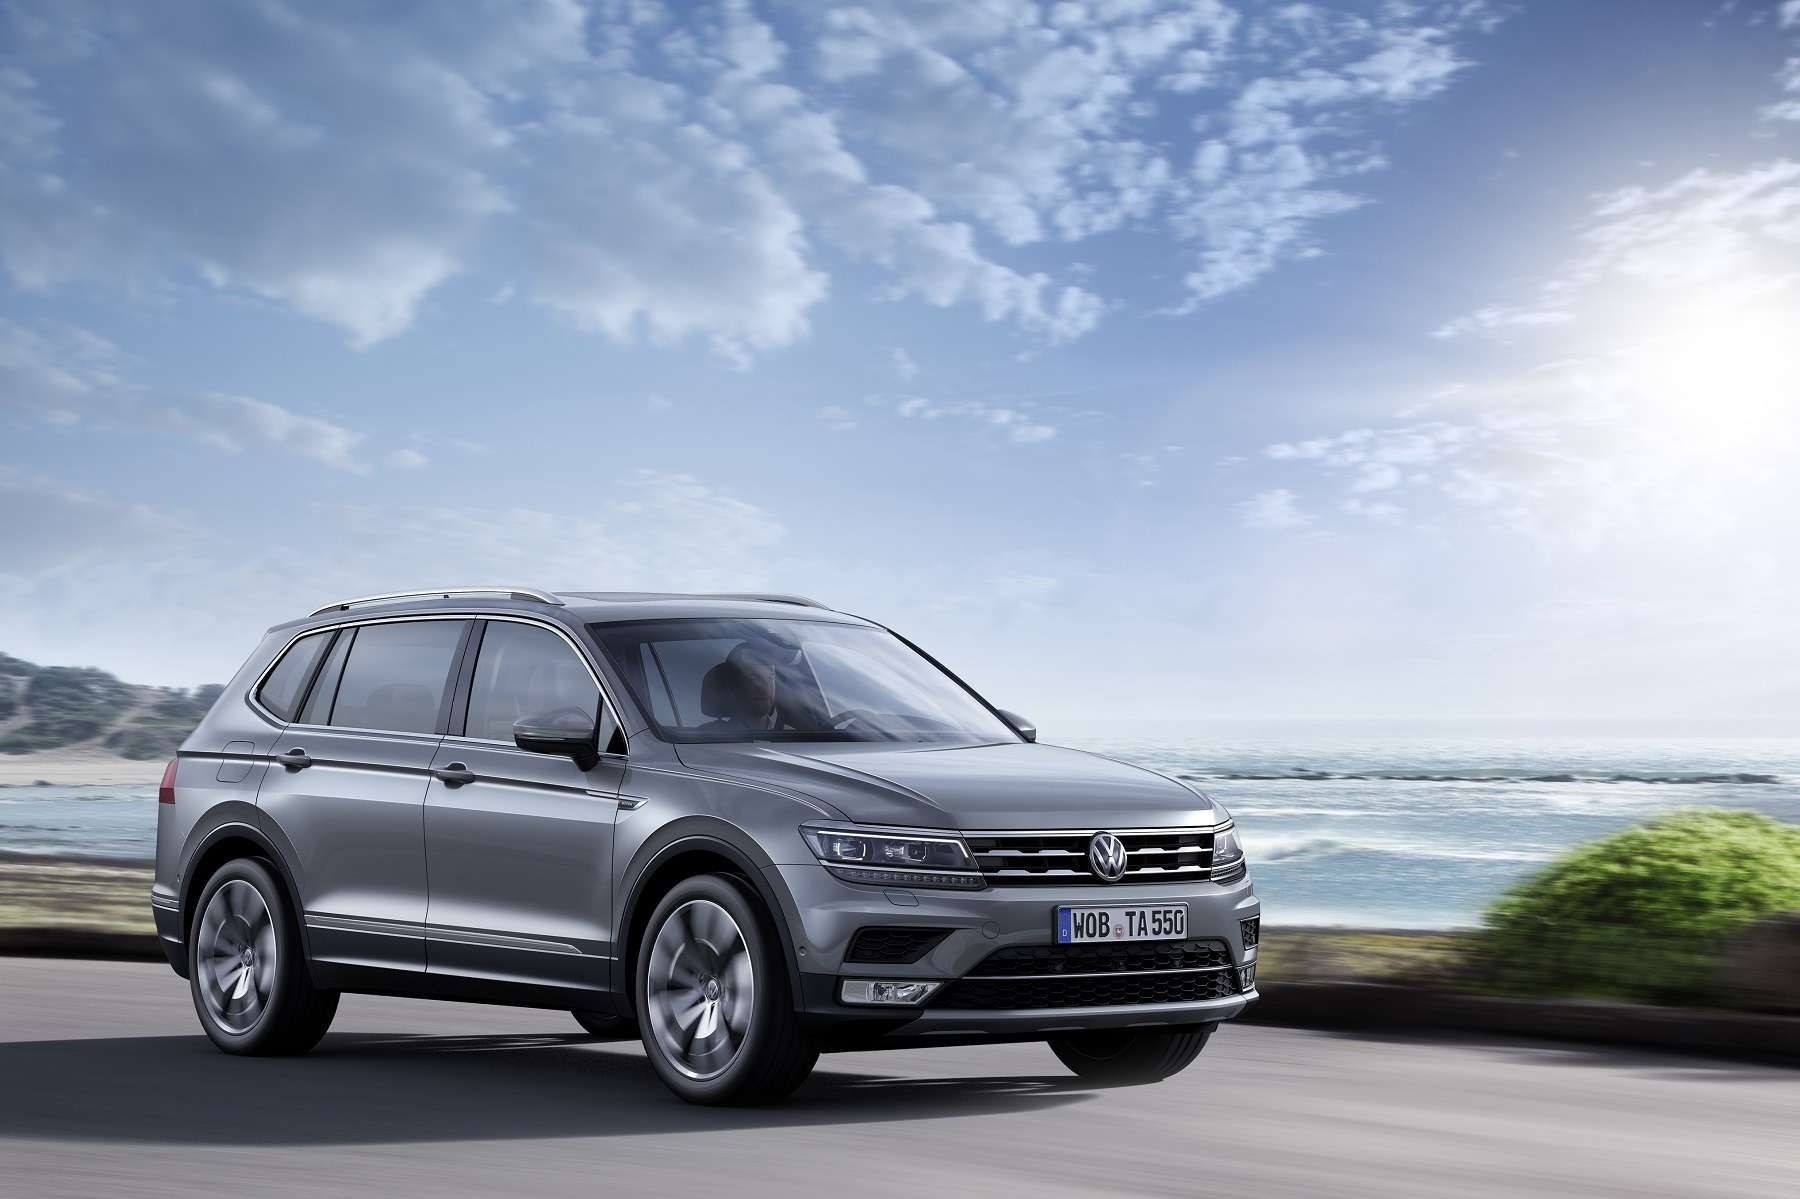 Беззнака равенства: Volkswagen Tiguan Allspace докатился доЕвропы— фото 716728